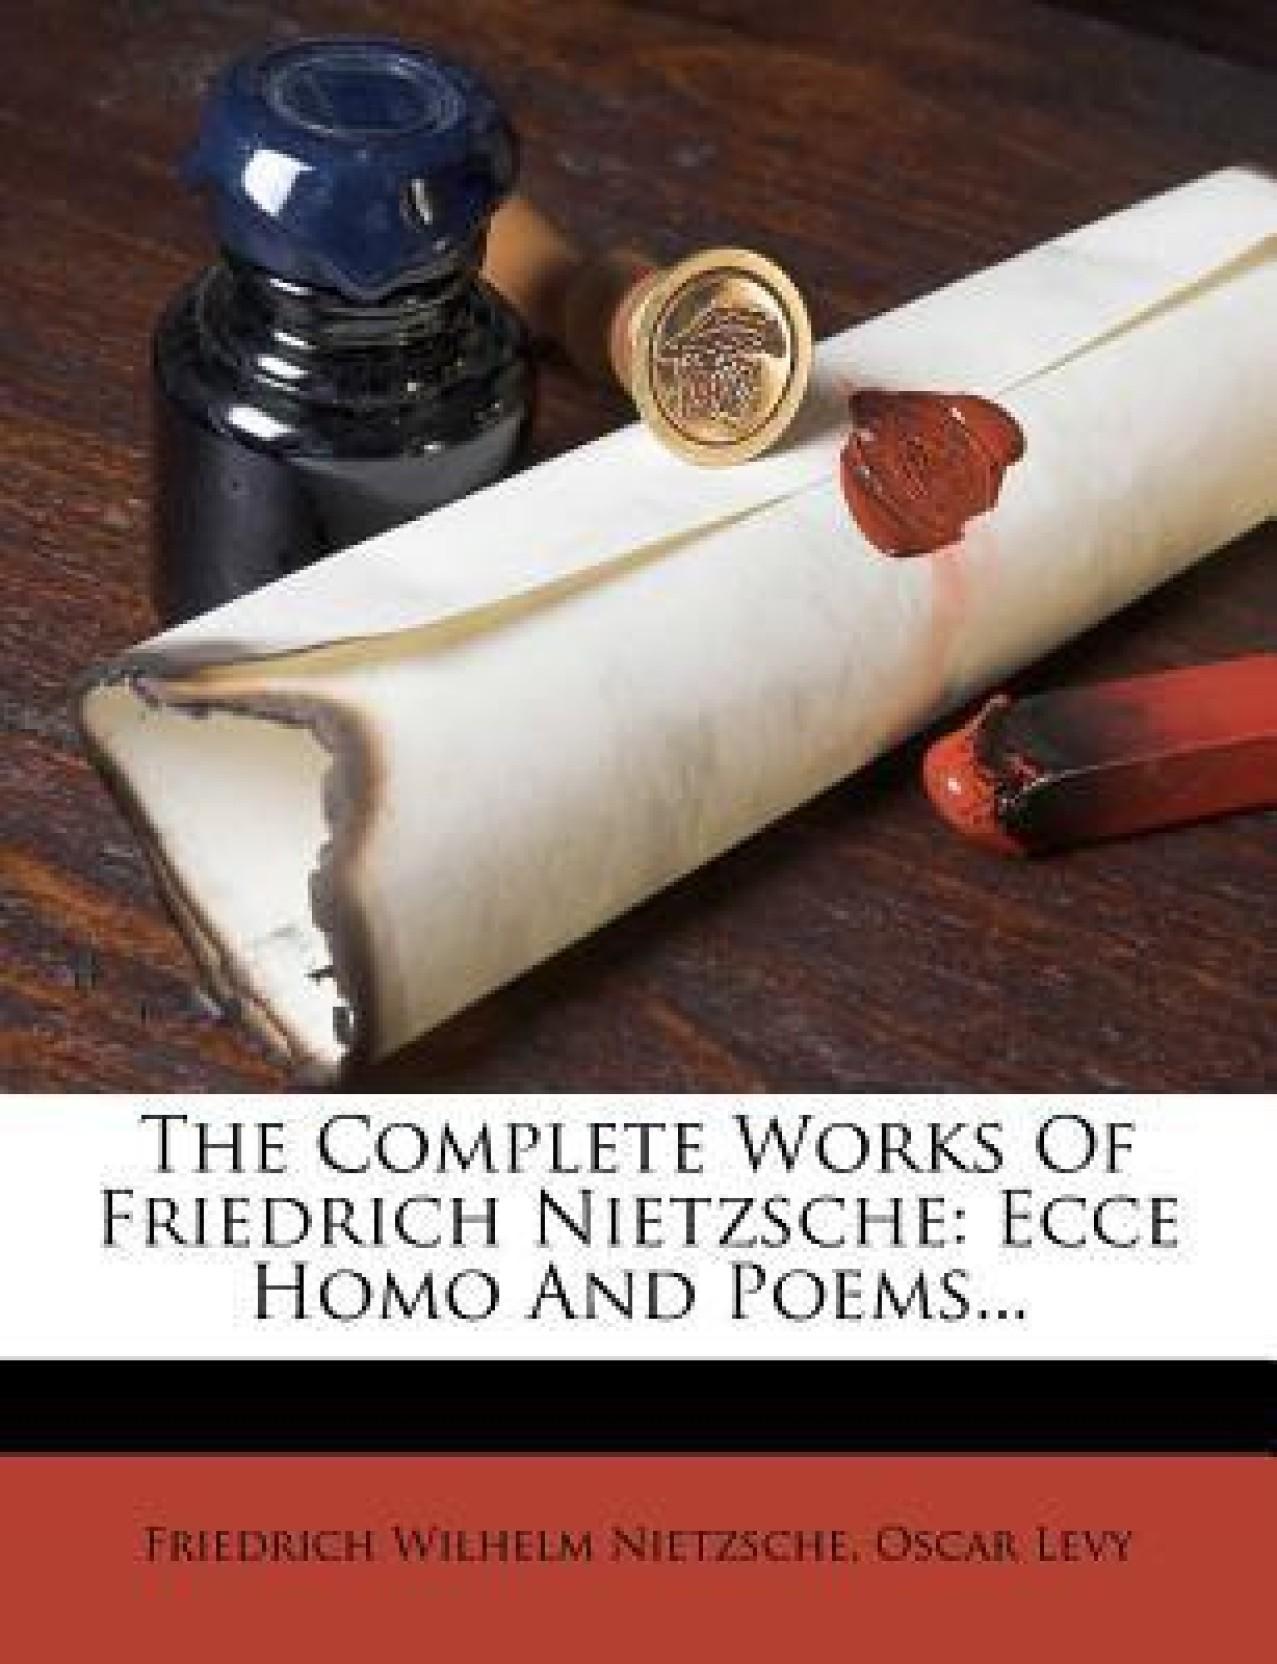 The Complete Works Of Friedrich Nietzsche Ecce Homo And